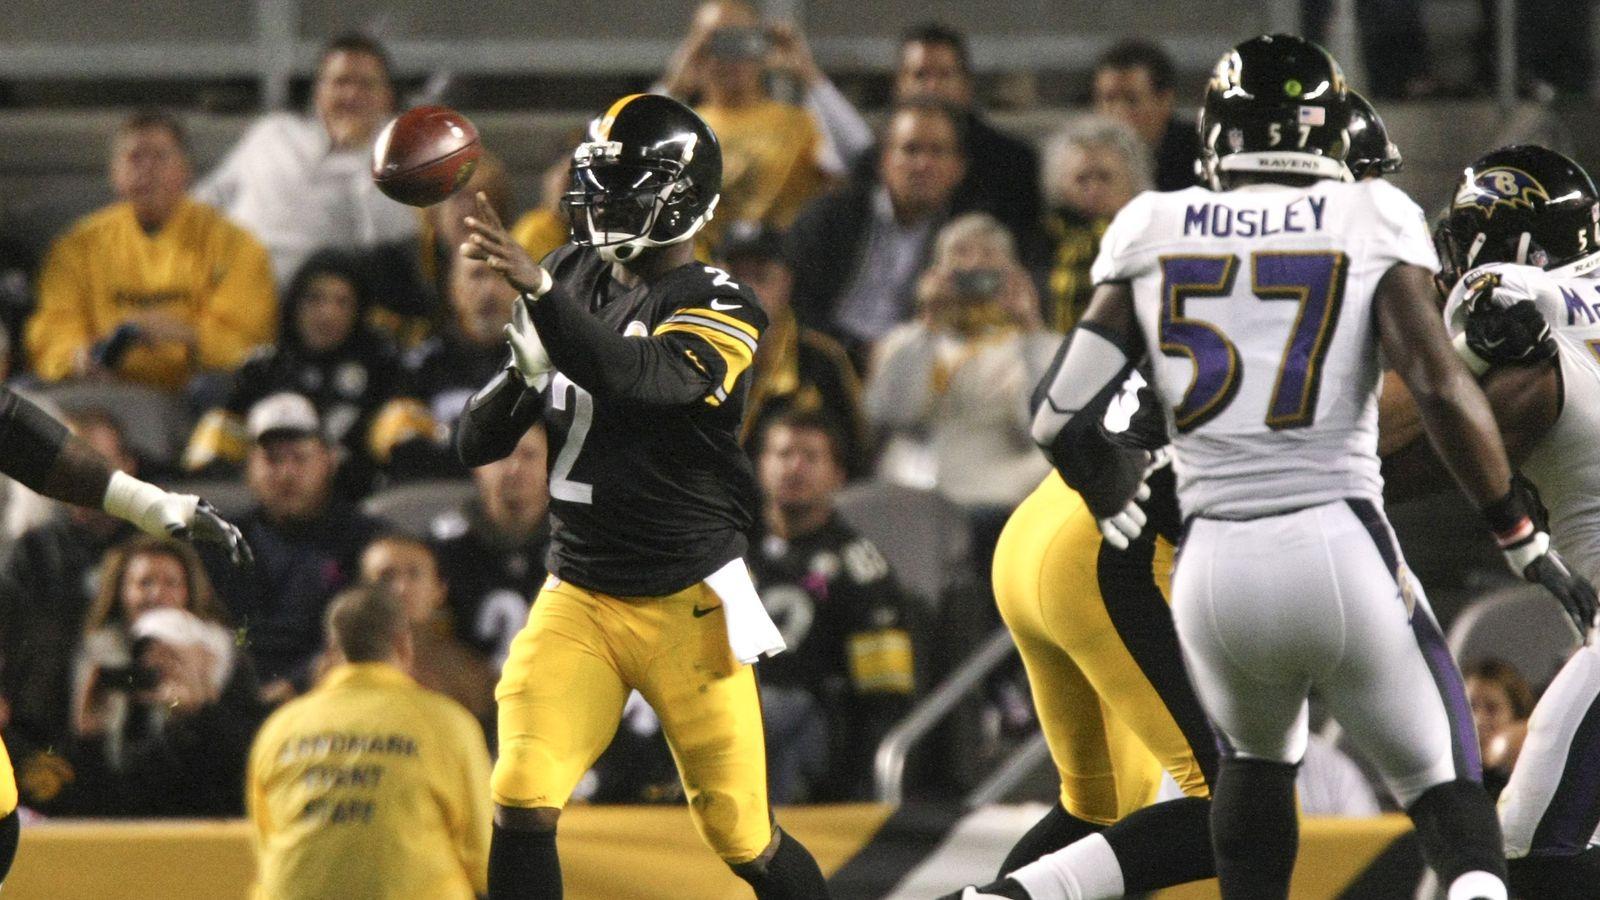 Ravens Vs Steelers 2015 Final Score Baltimore Wins 23